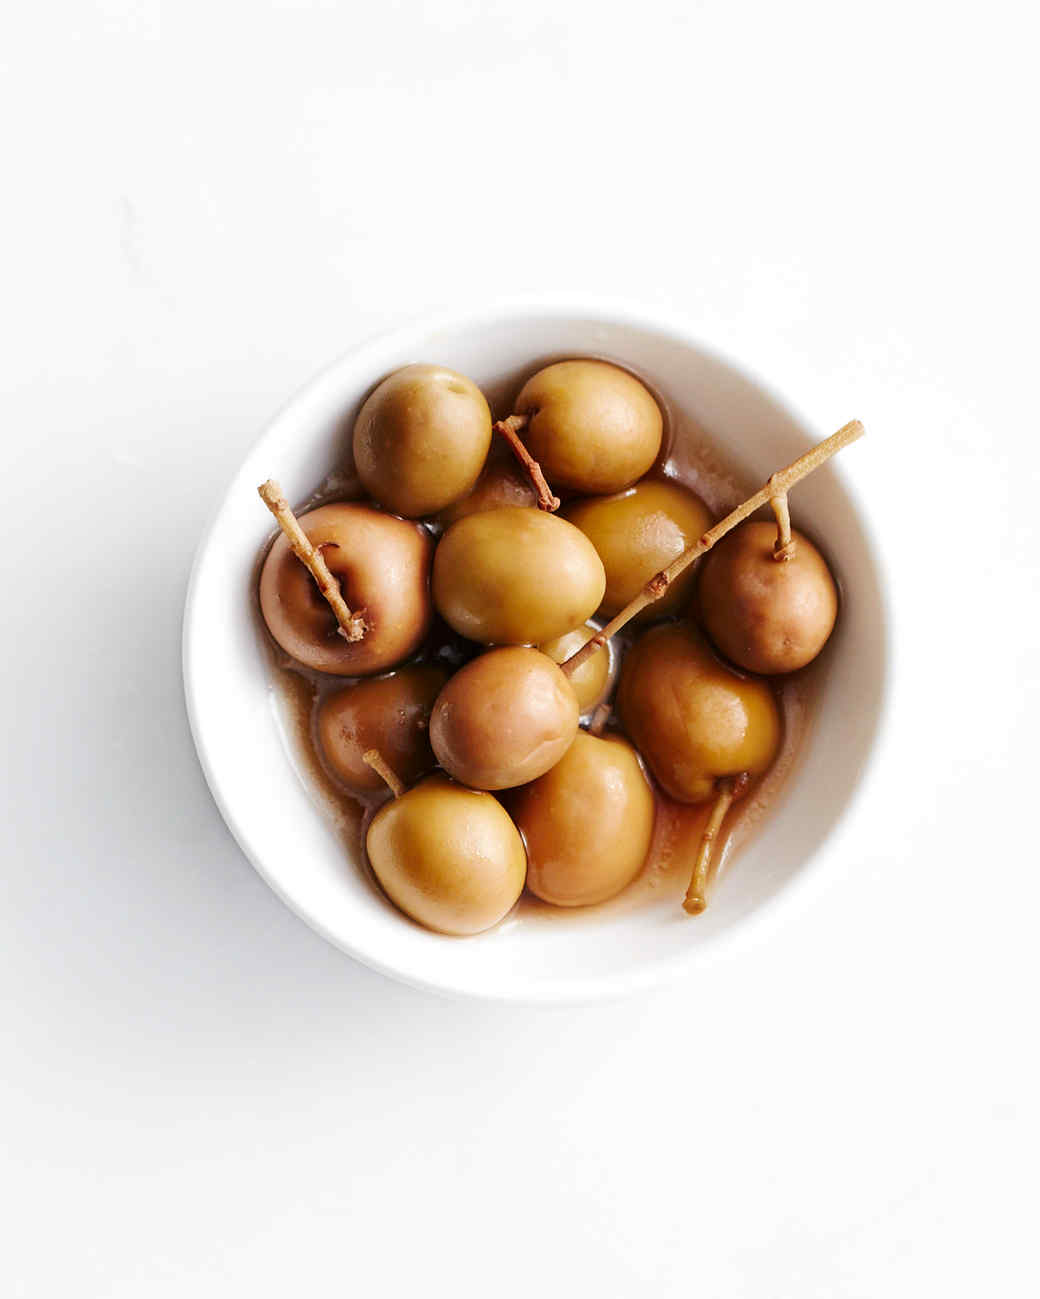 olive-ipad-arbequina-0099-ld110630-0614.jpg